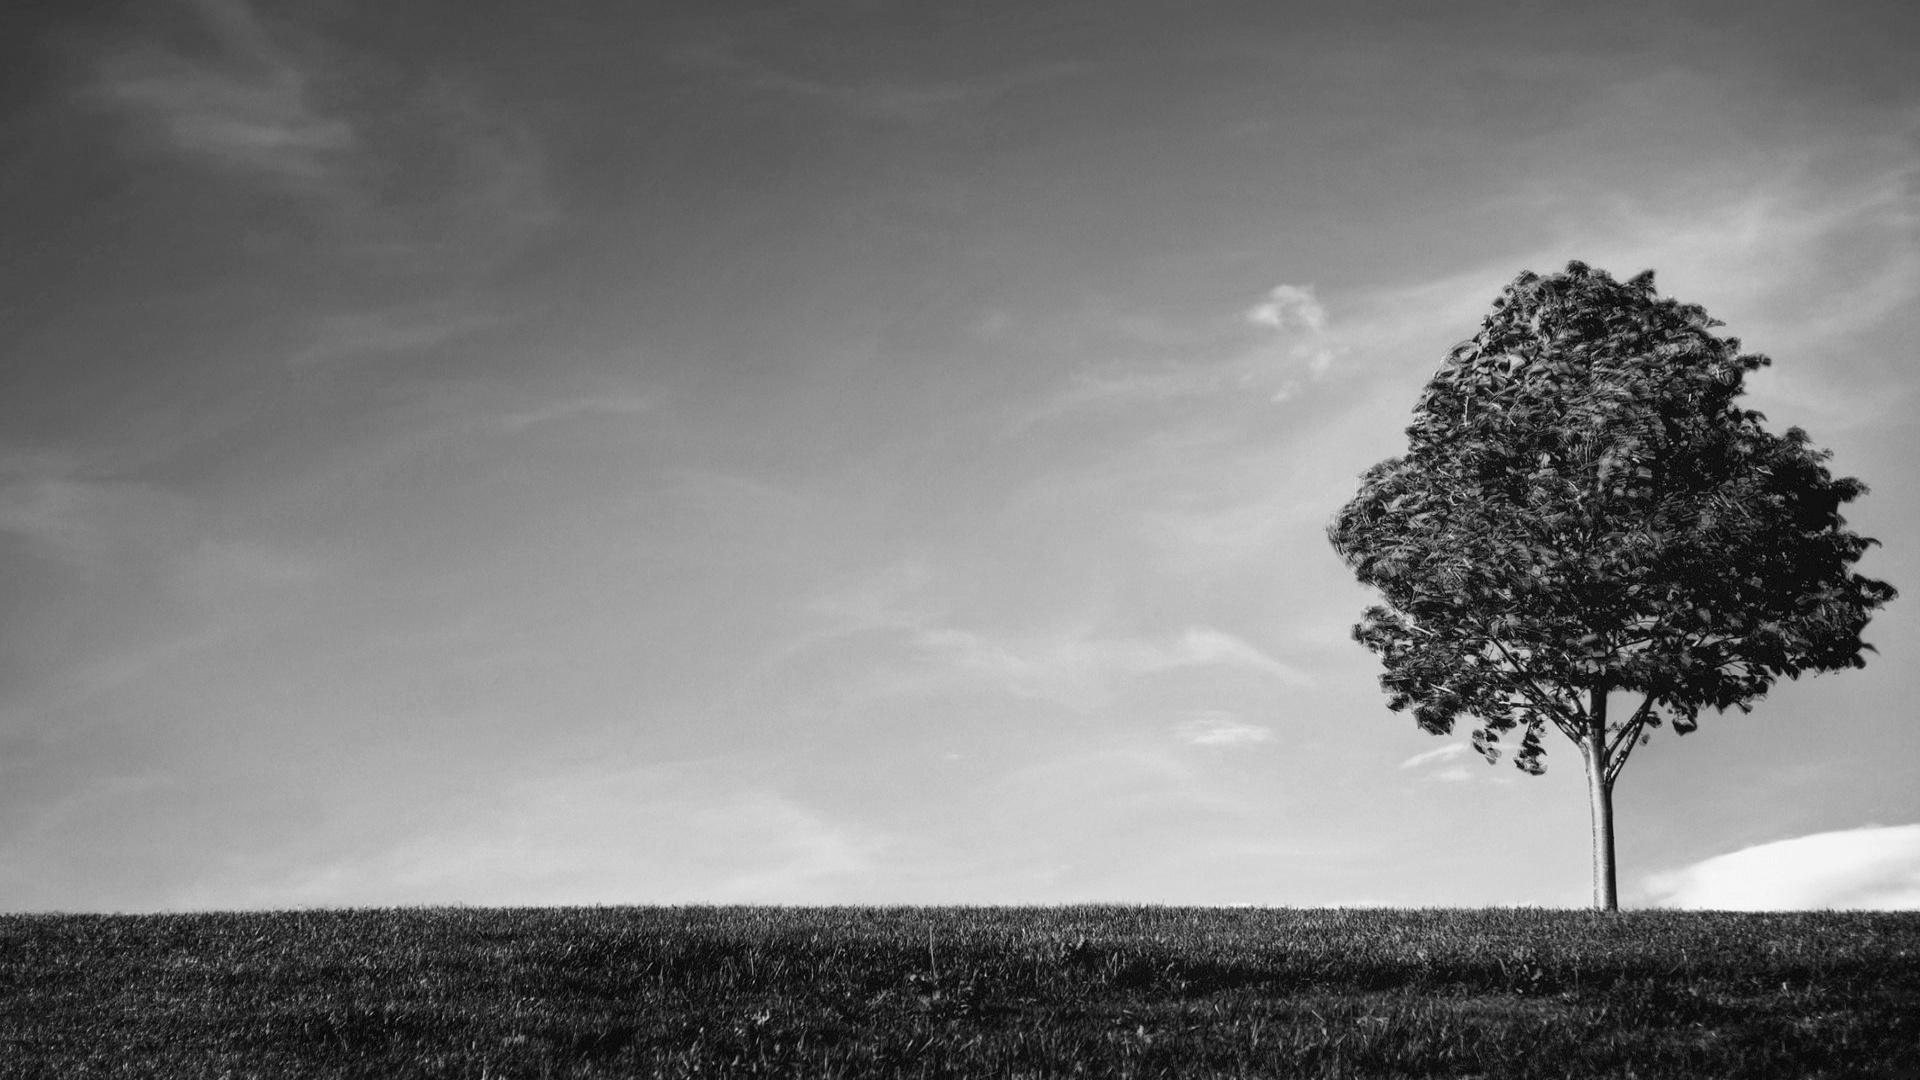 Tree Wallpaper Black And White 1920x1080